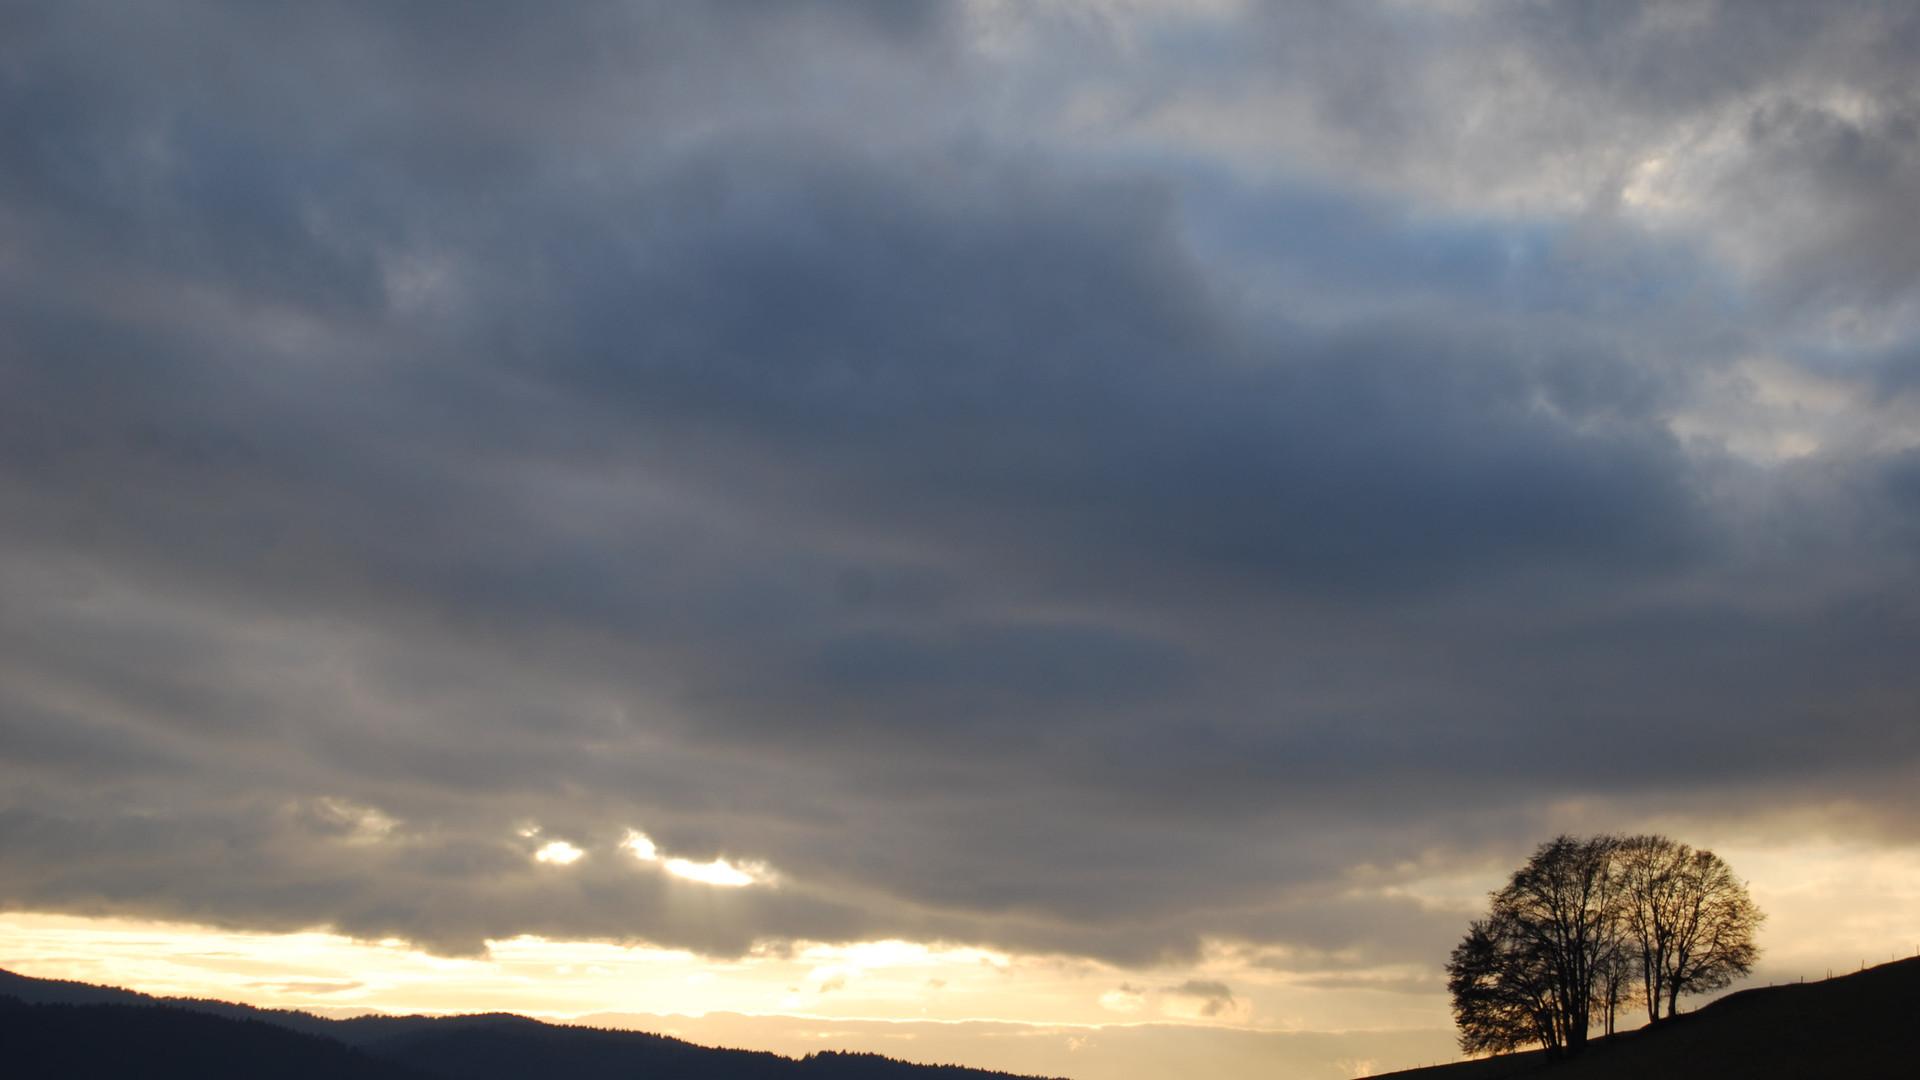 tramonto asiago 12 (2).JPG